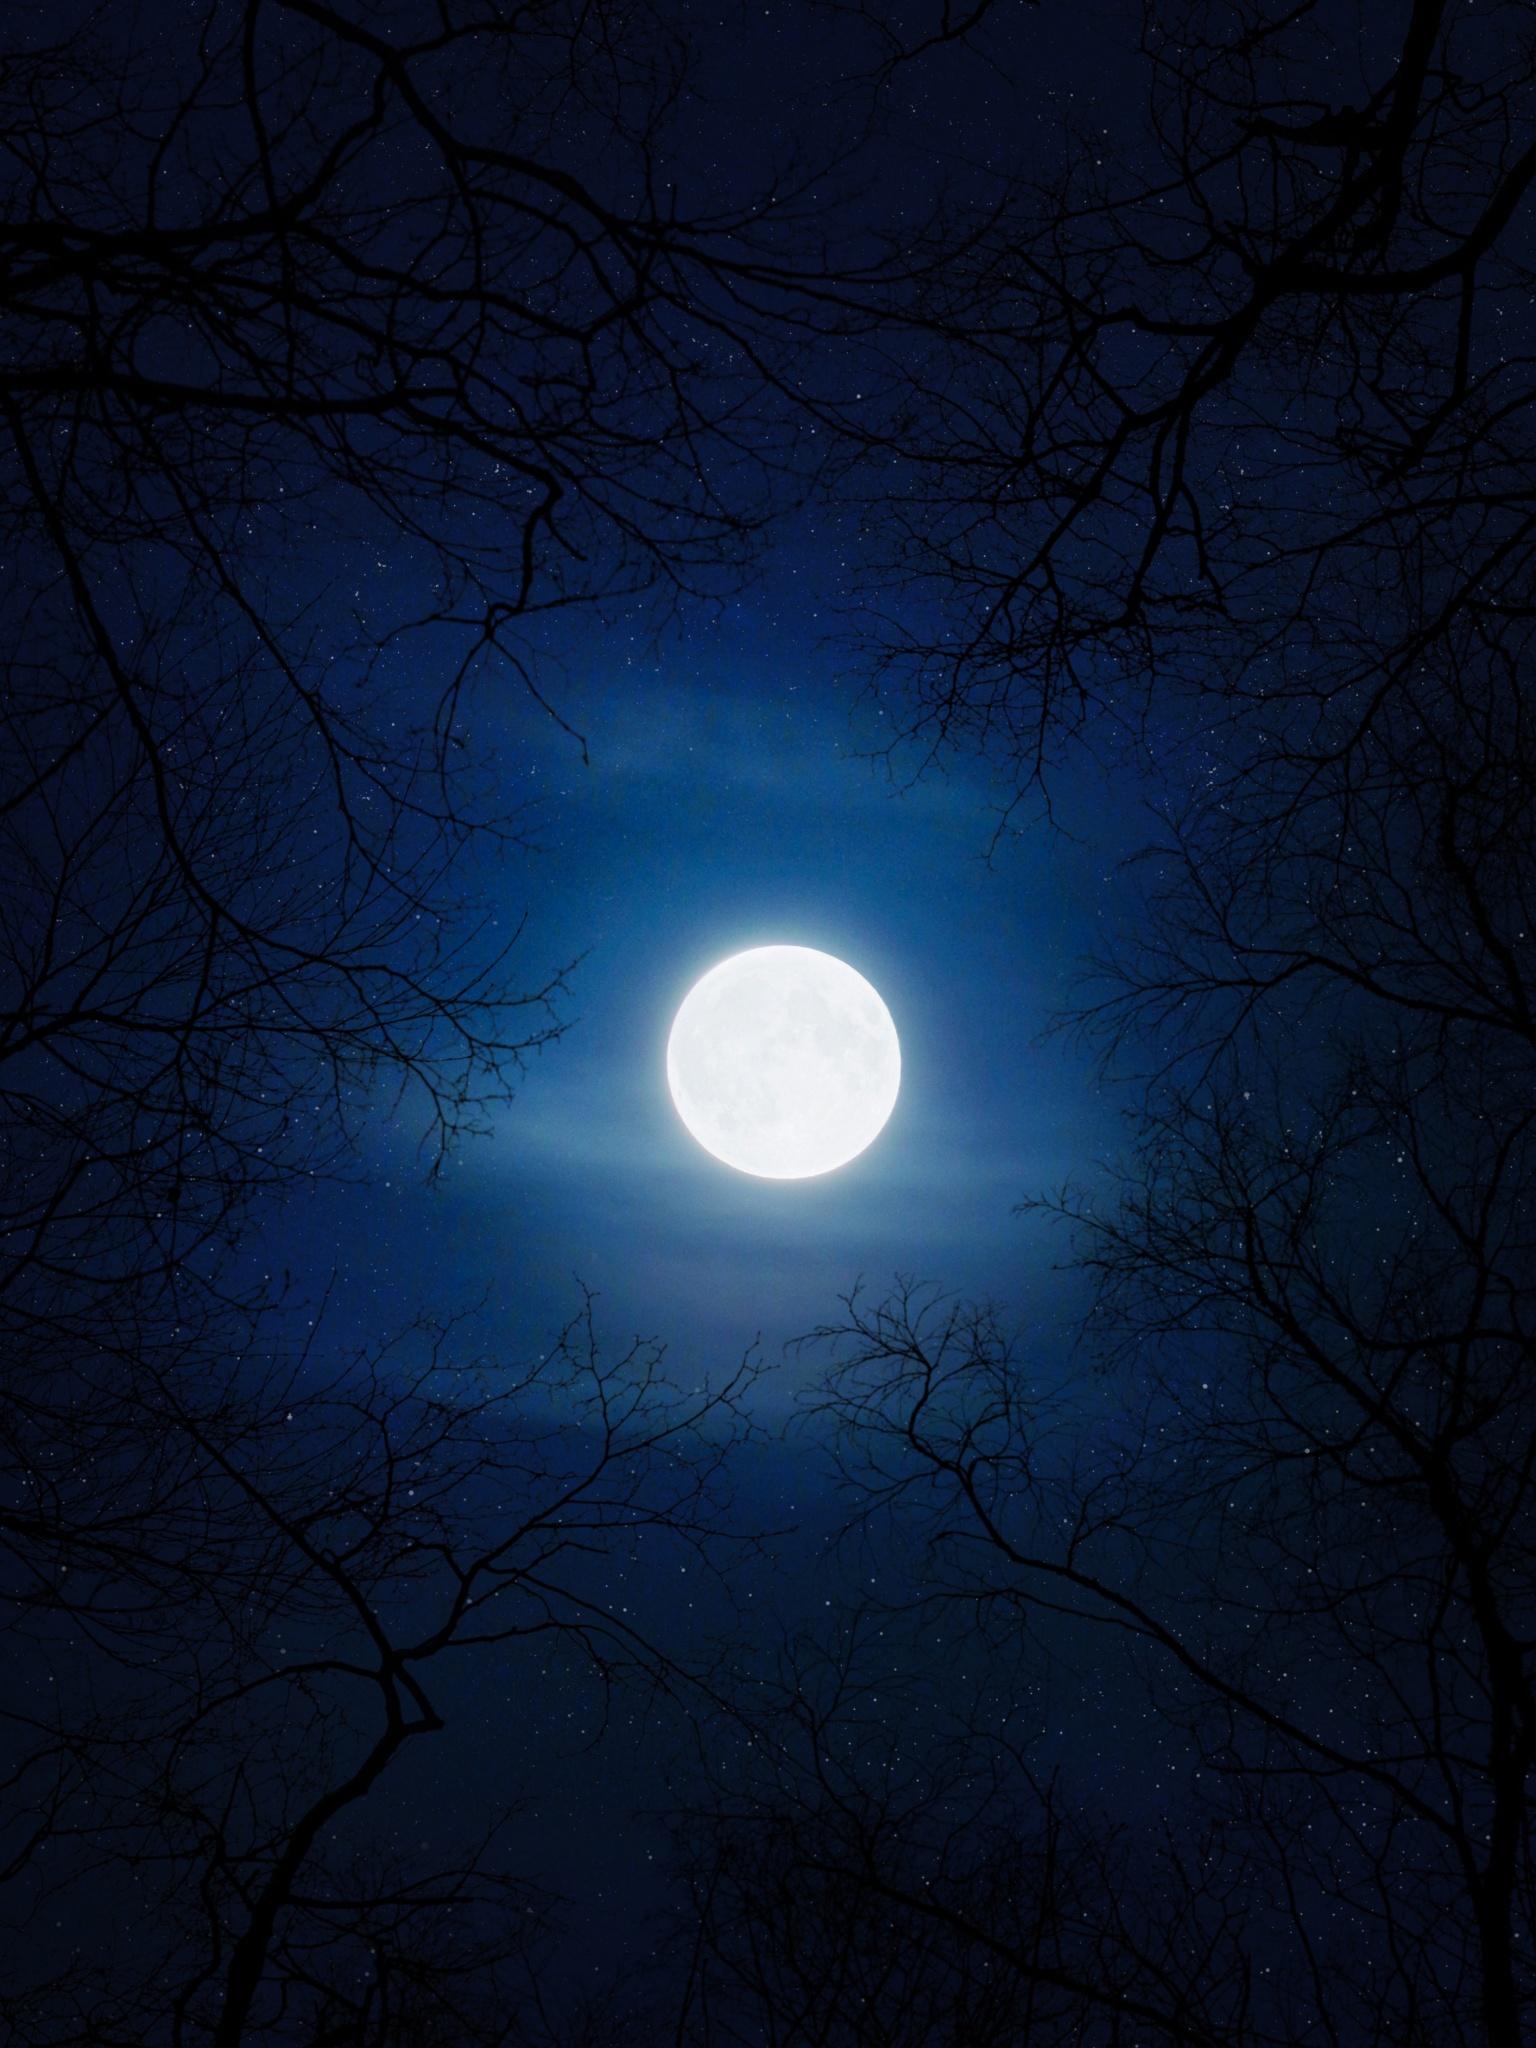 Moon 4k Wallpaper Night Cold Trees Blue Sky Full Moon Nature 1093